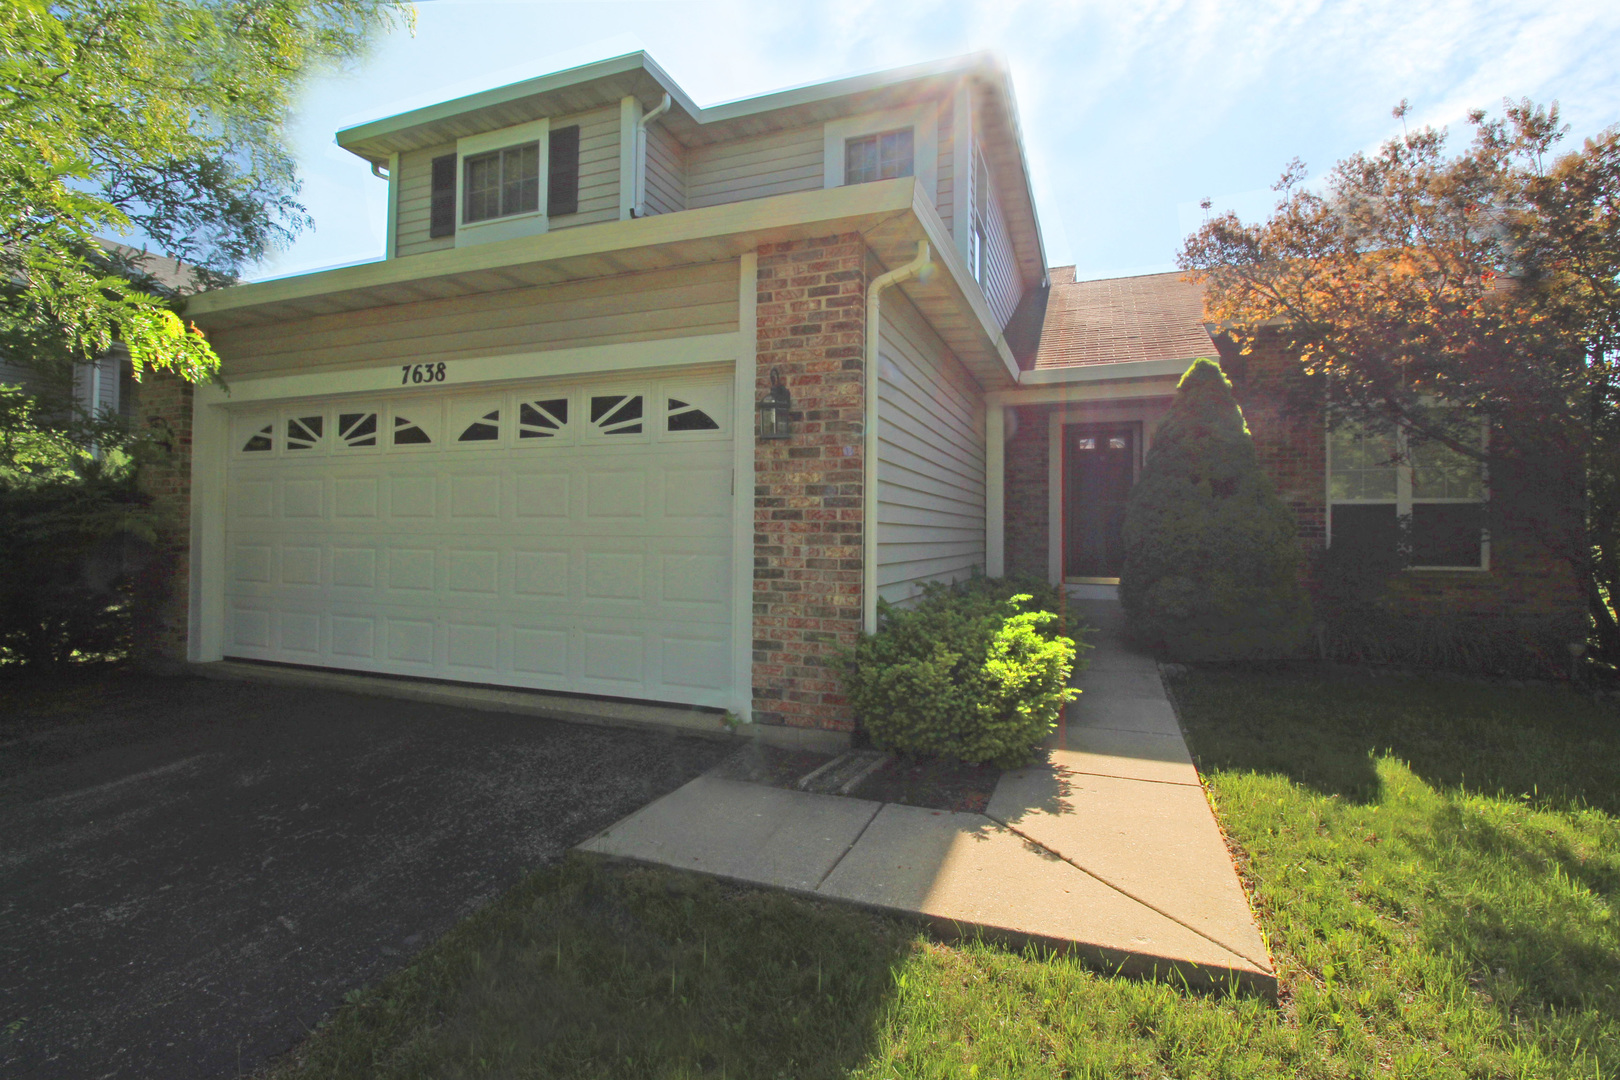 7638 Mendocino Drive, Gurnee, Illinois 60031